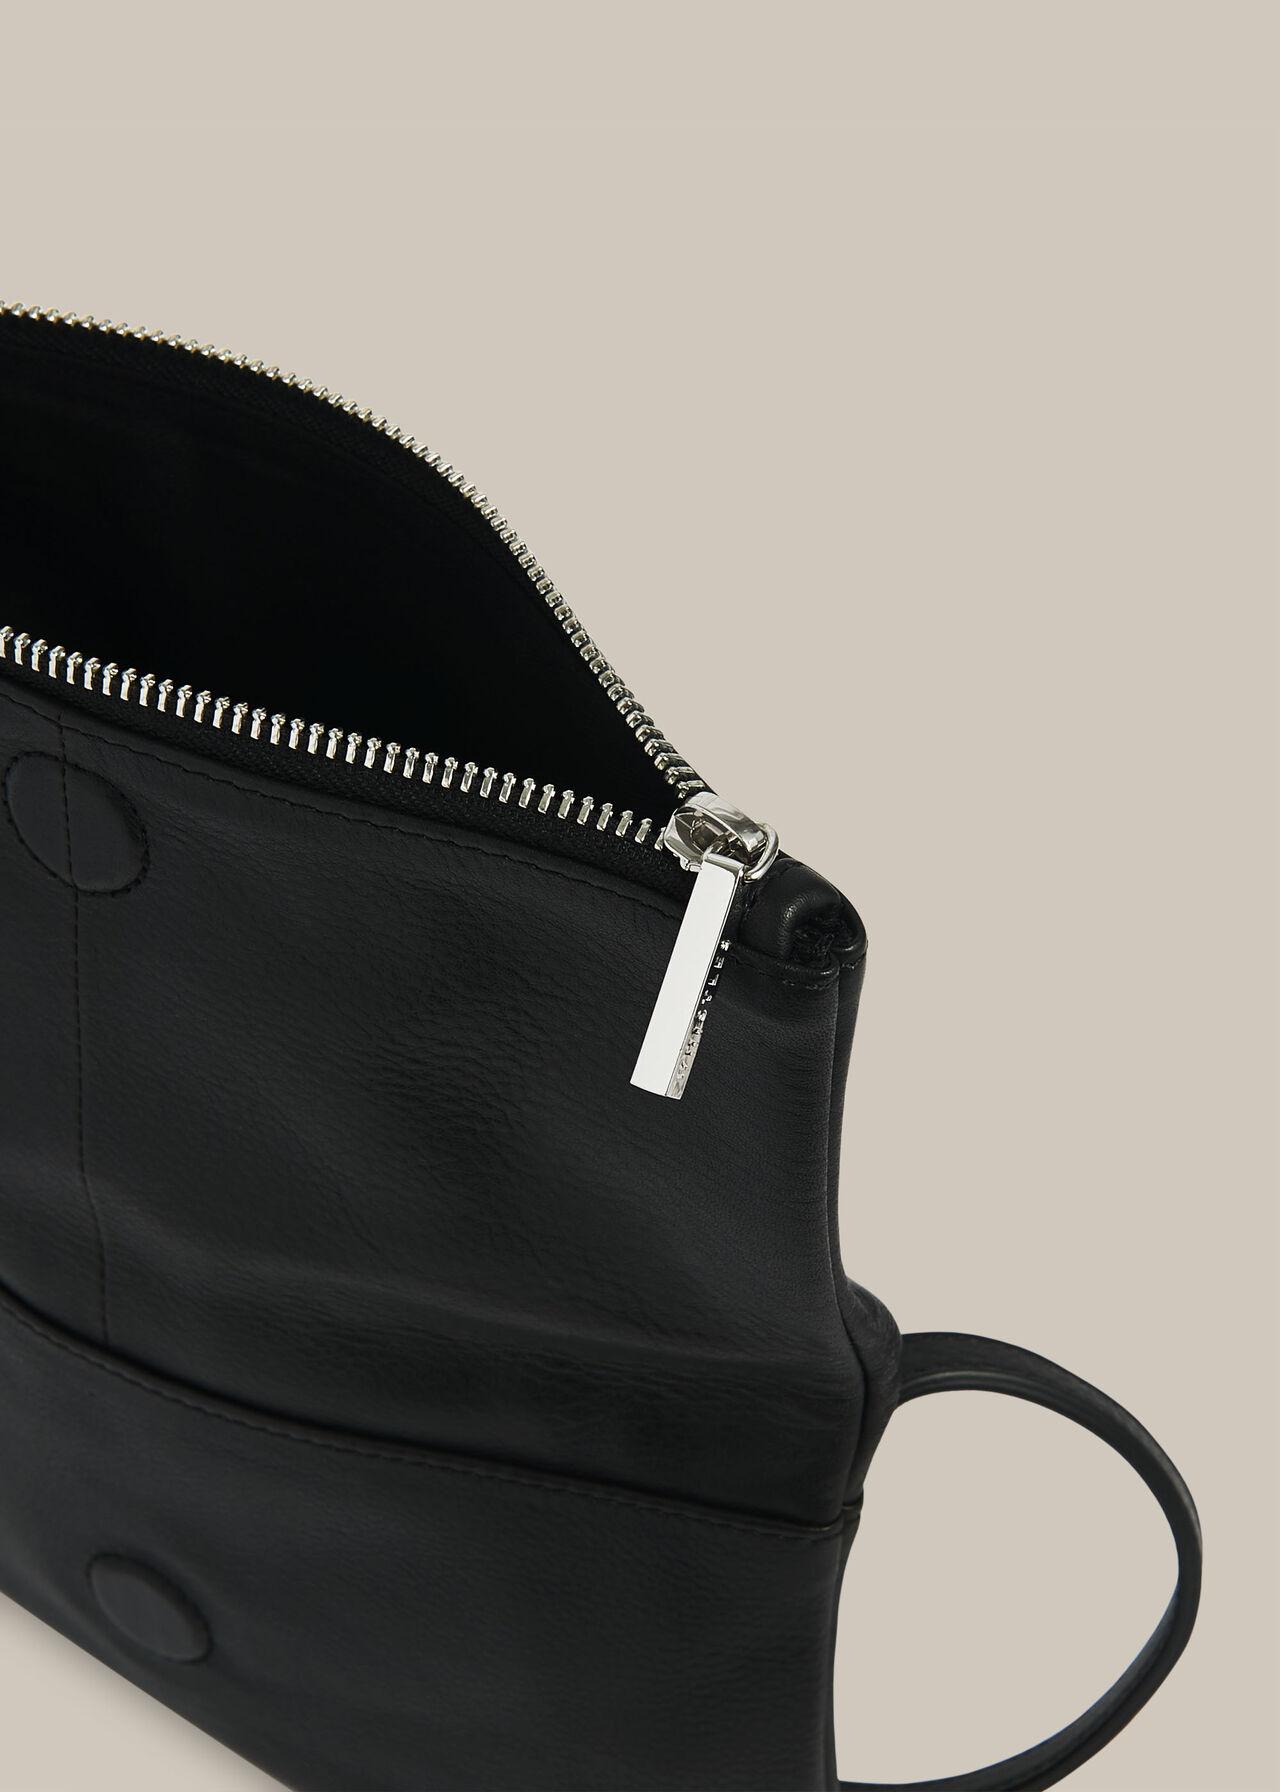 Issy Mini Foldover Bag